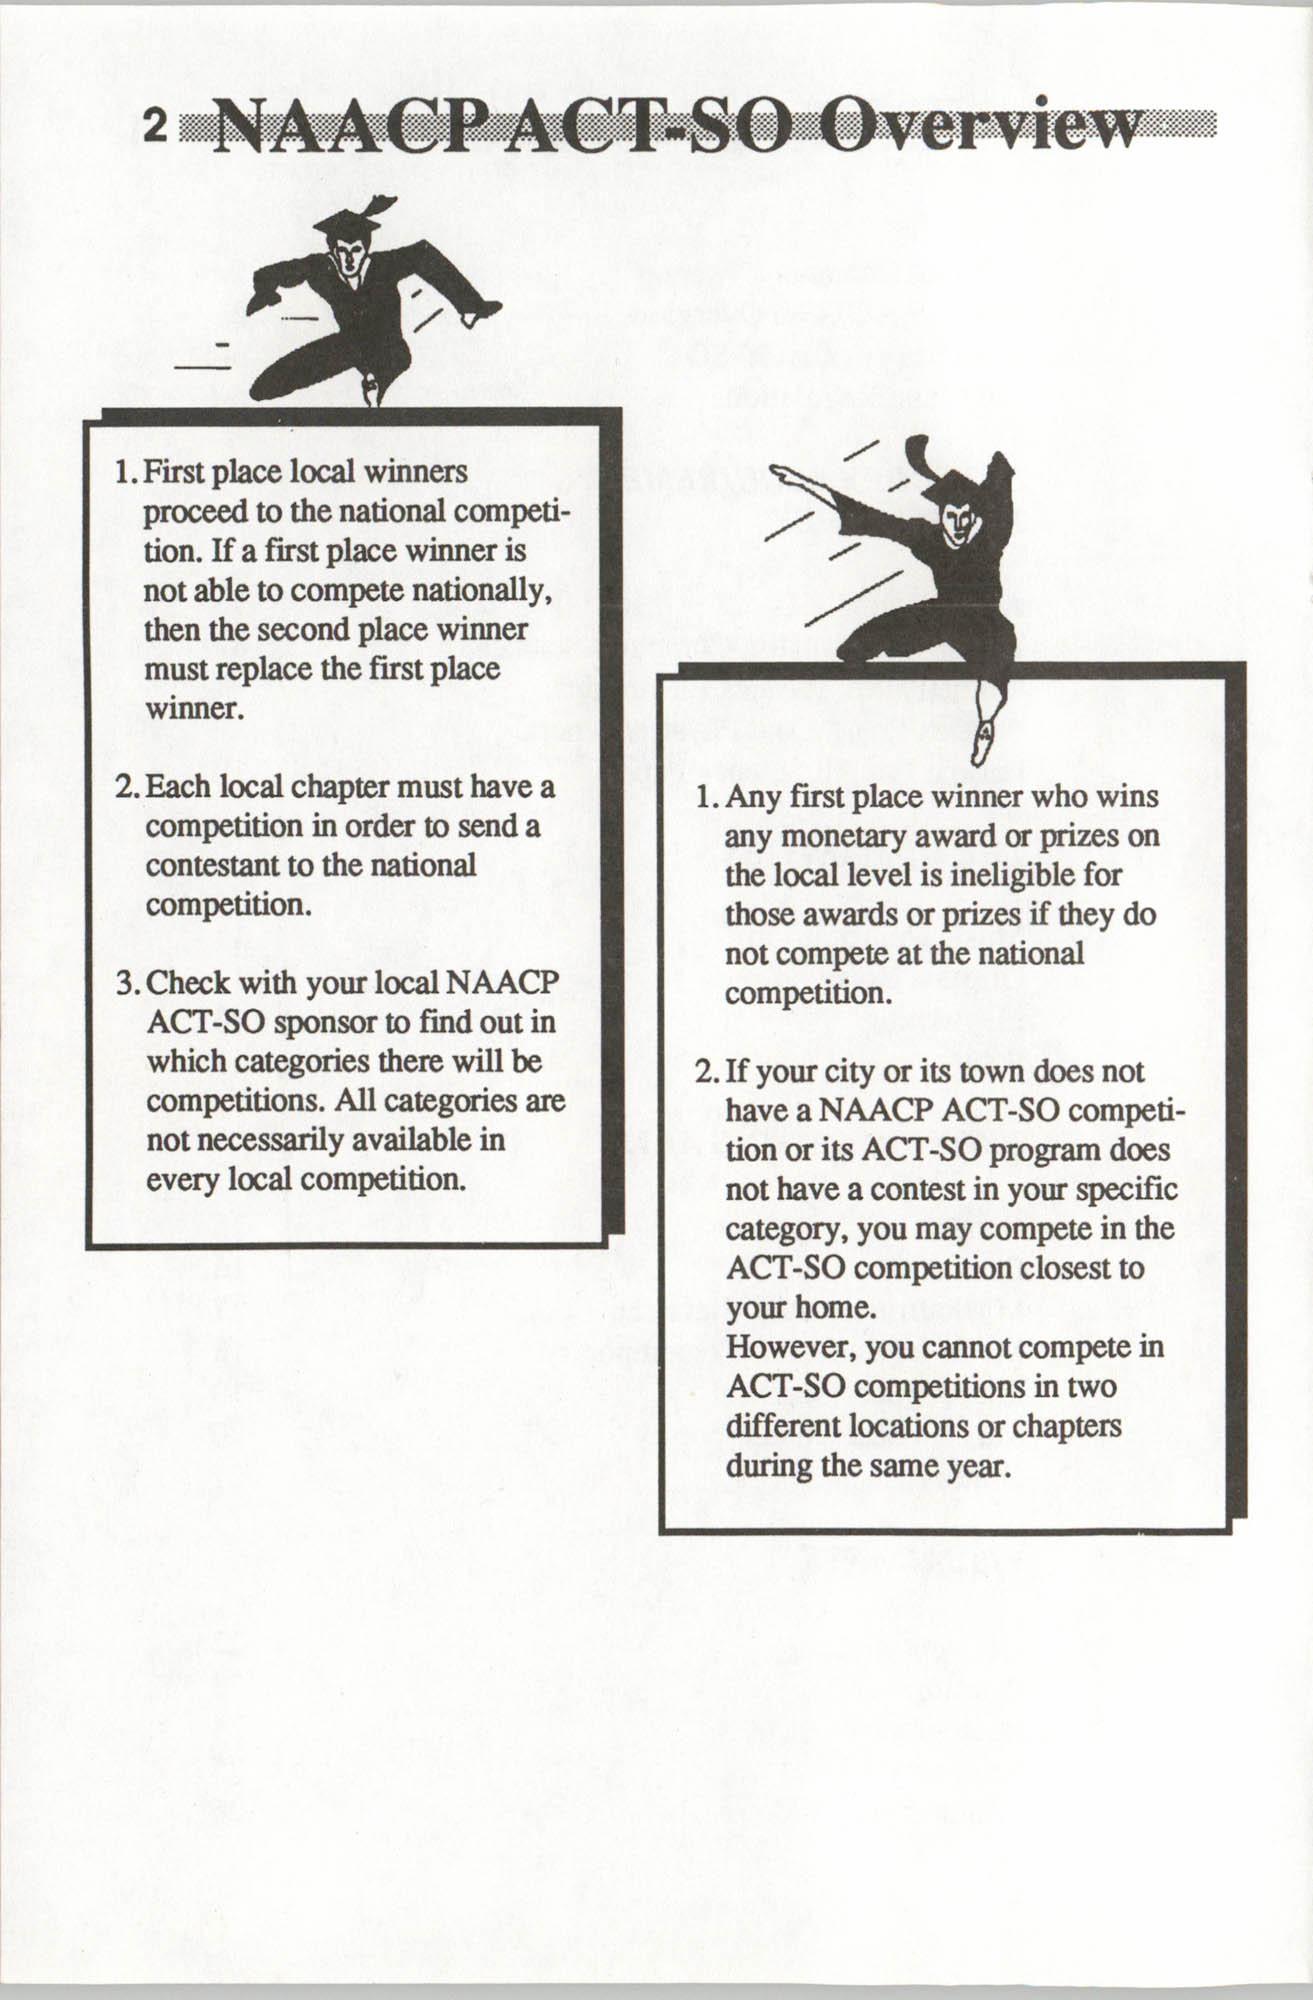 Brochure, ACT-SO Program, NAACP, 1992, Page 2